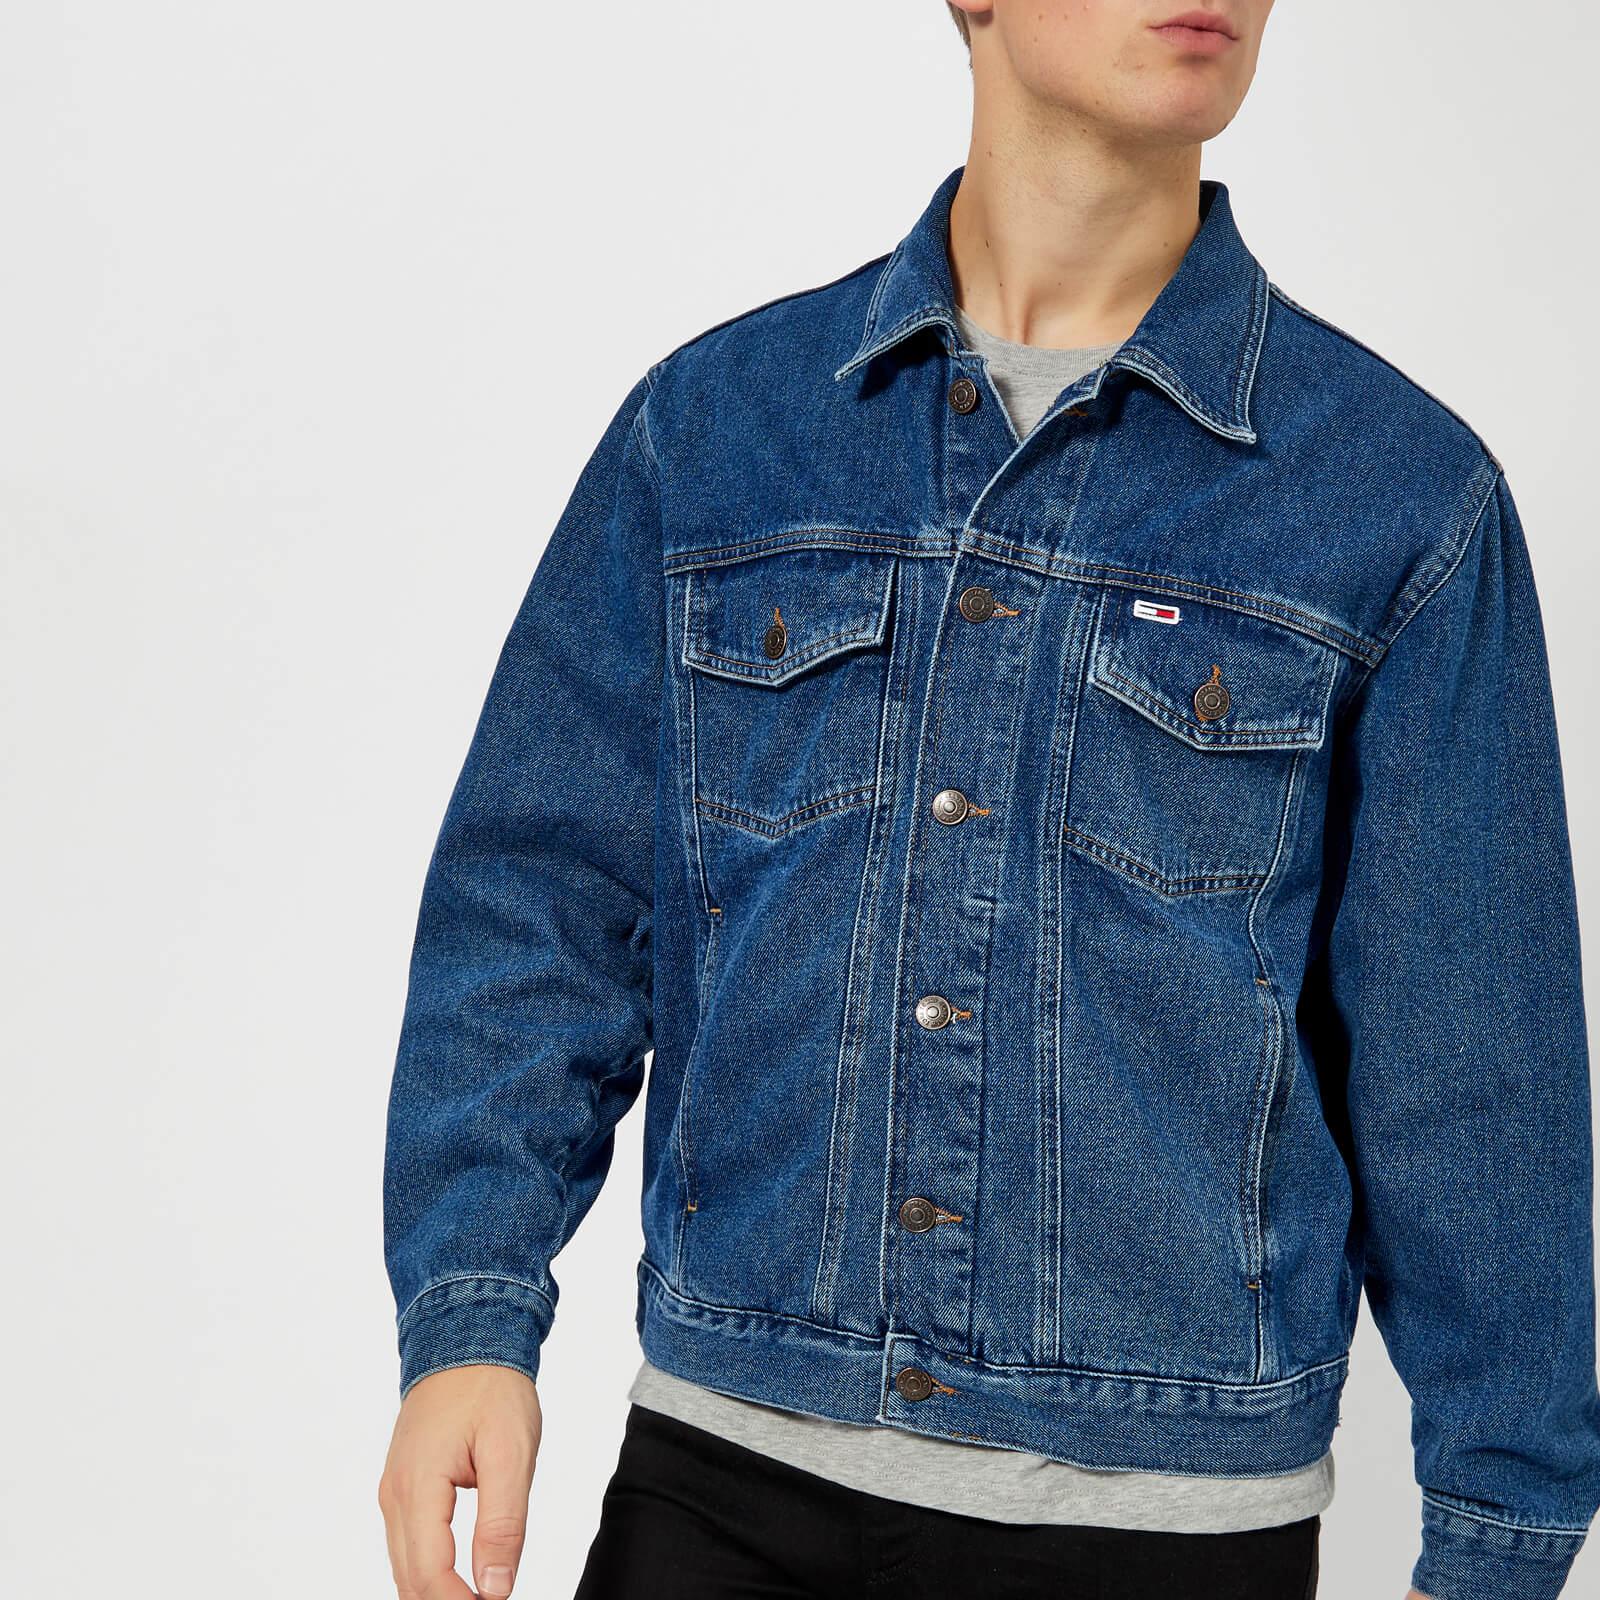 086596e55ee Tommy Jeans Men's Classic Denim Jacket - Mid Blue Rigid Clothing |  TheHut.com